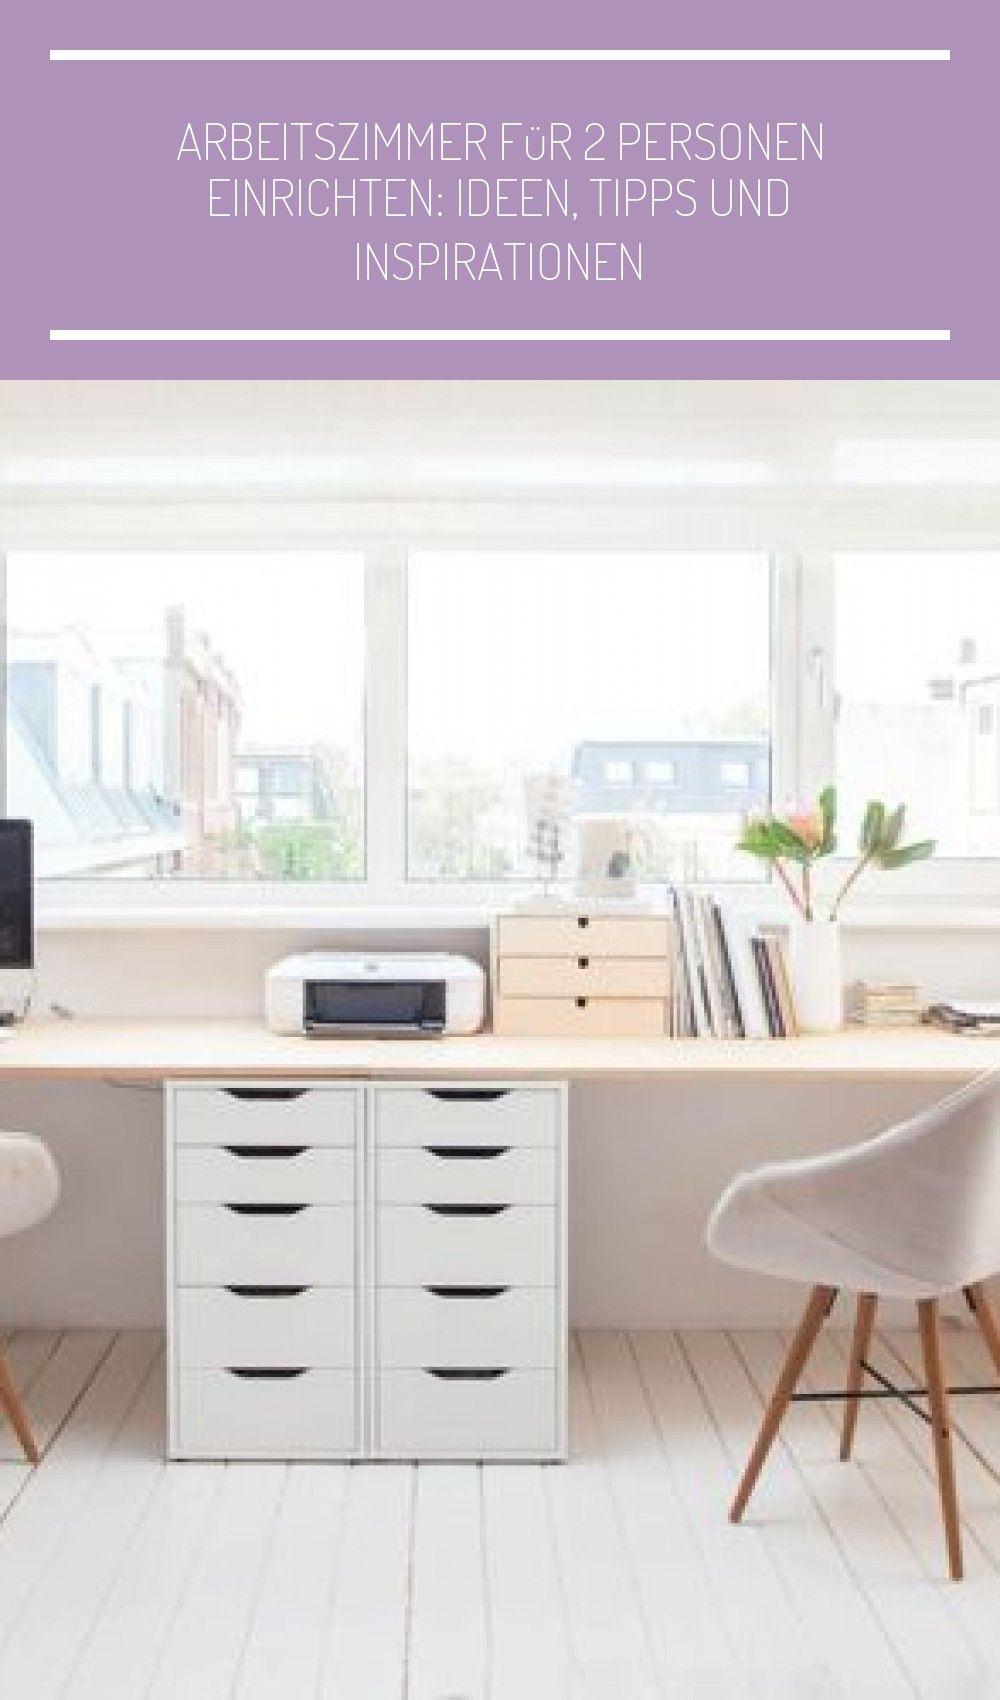 Arbeitszimmer Fur 2 Personen E In 2021 Inspiration Home Decor Motif Design